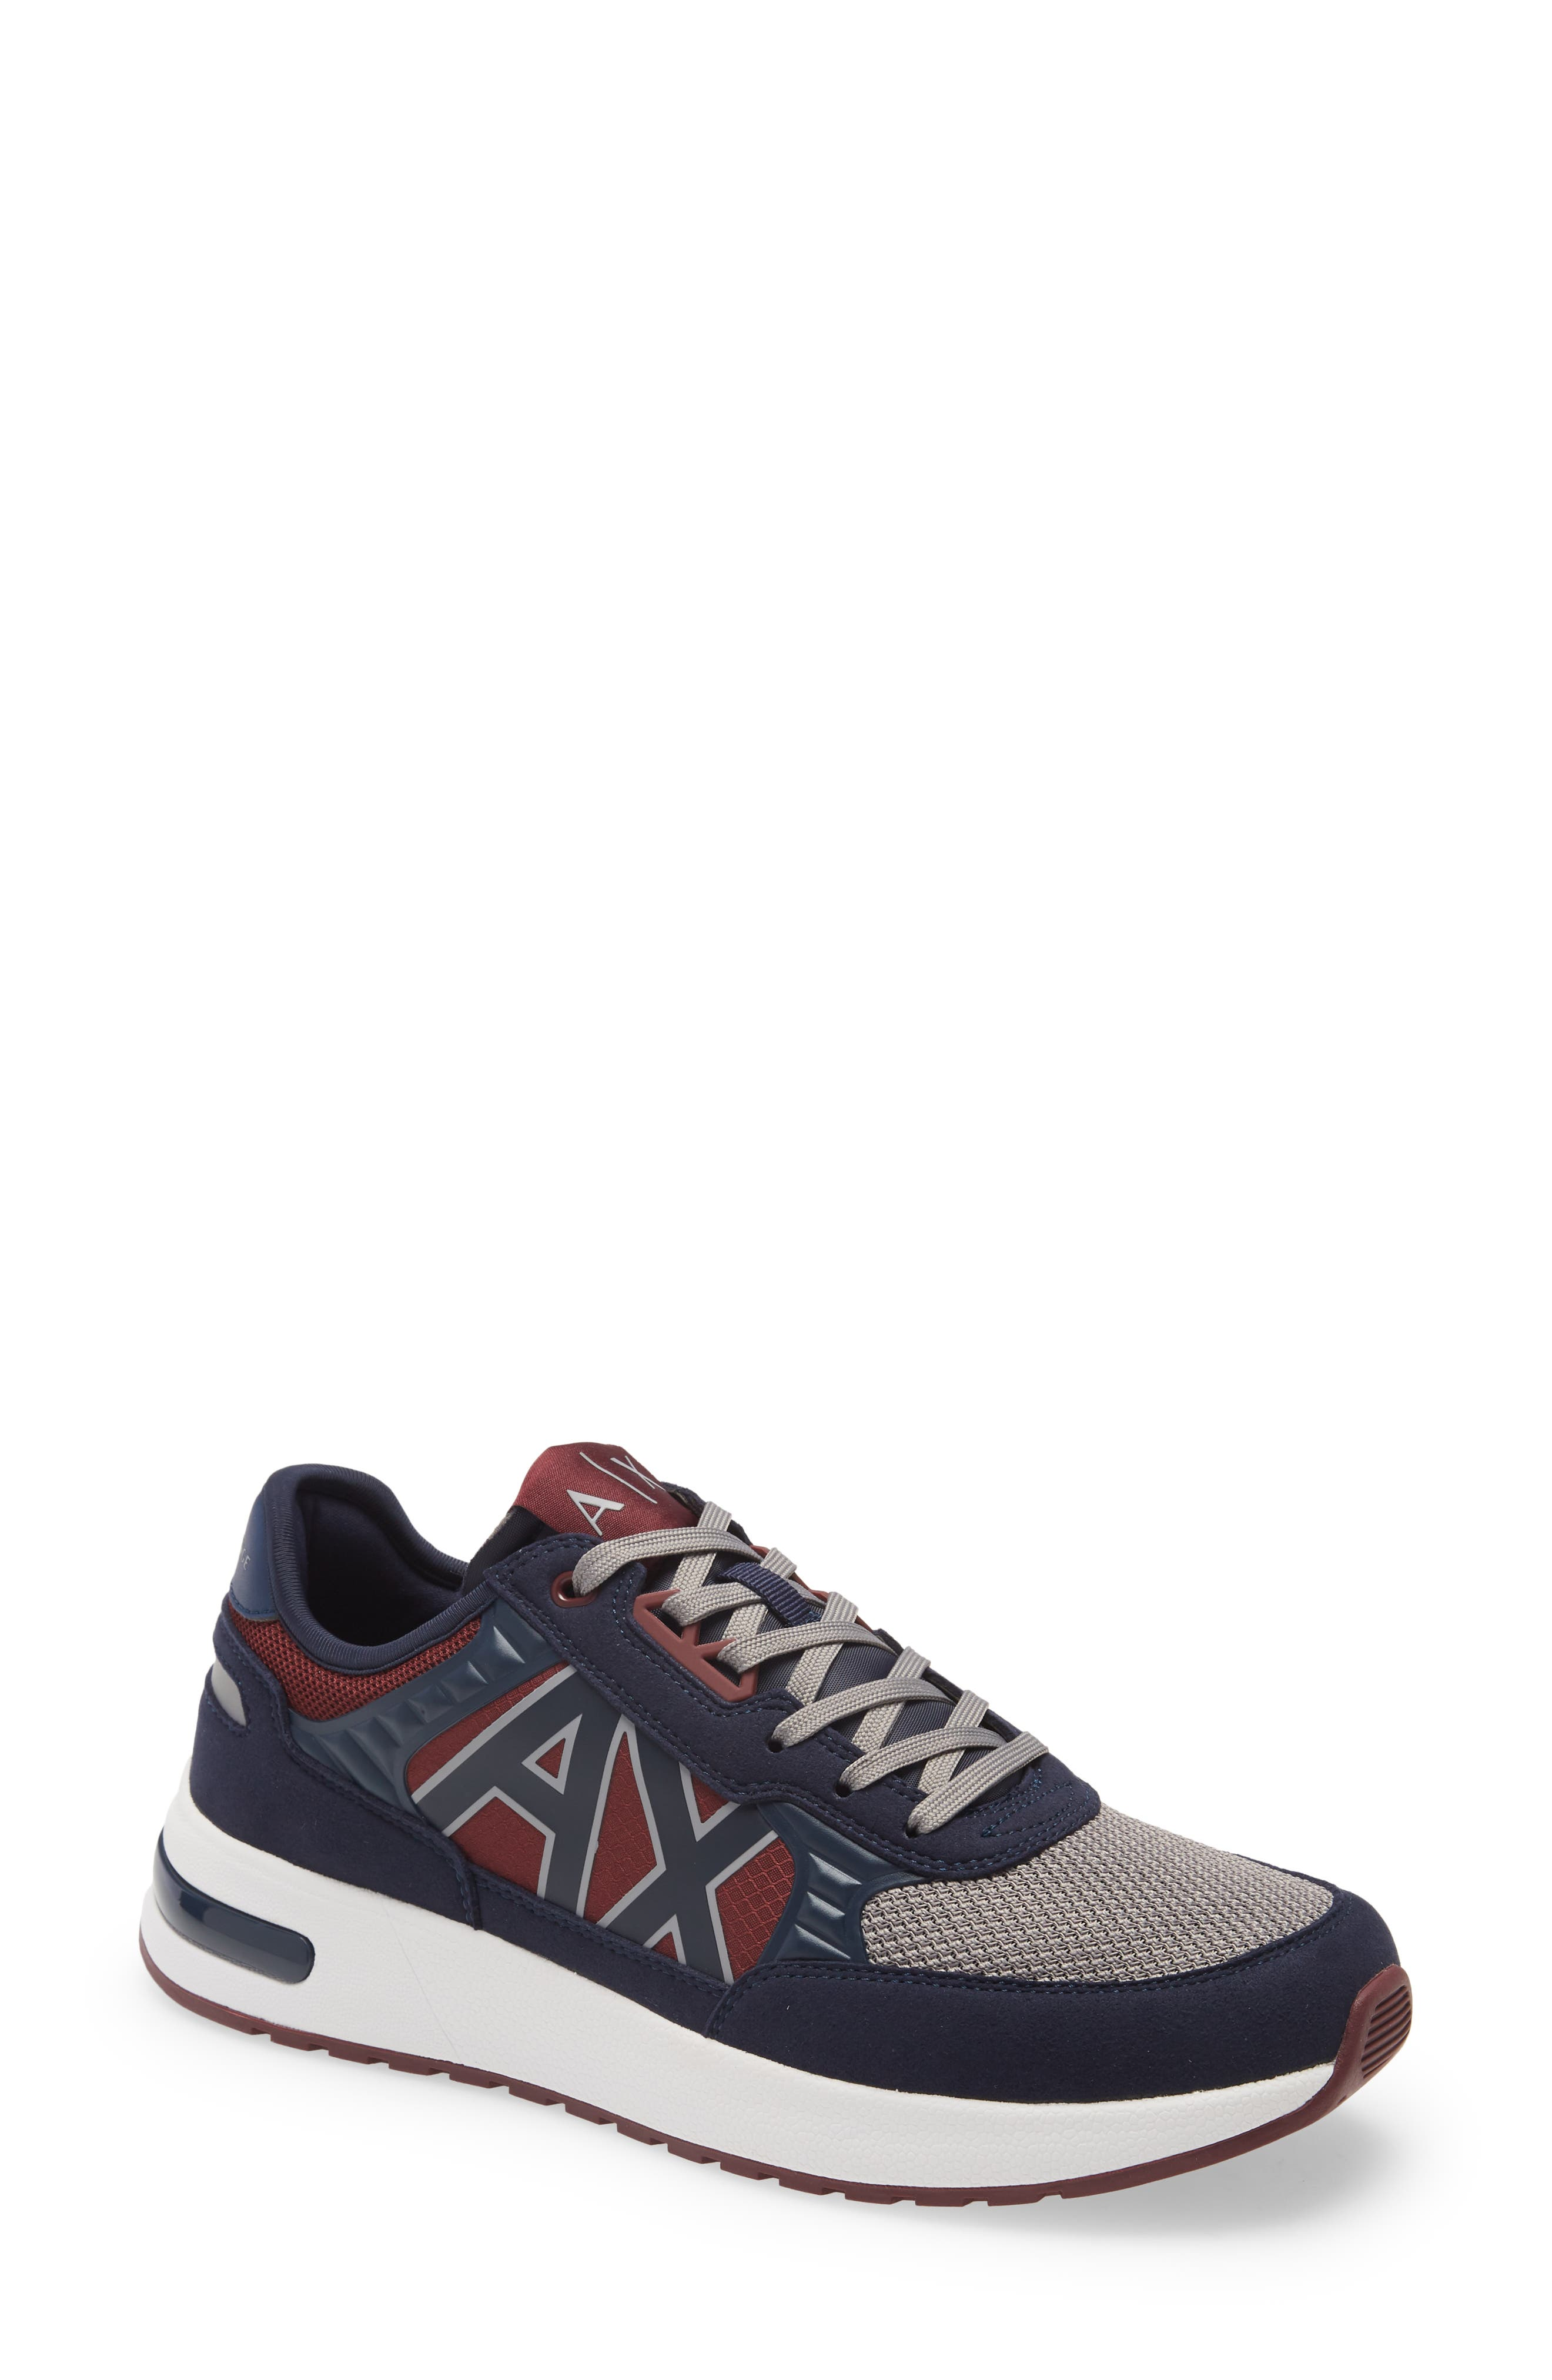 Contrast Sneaker